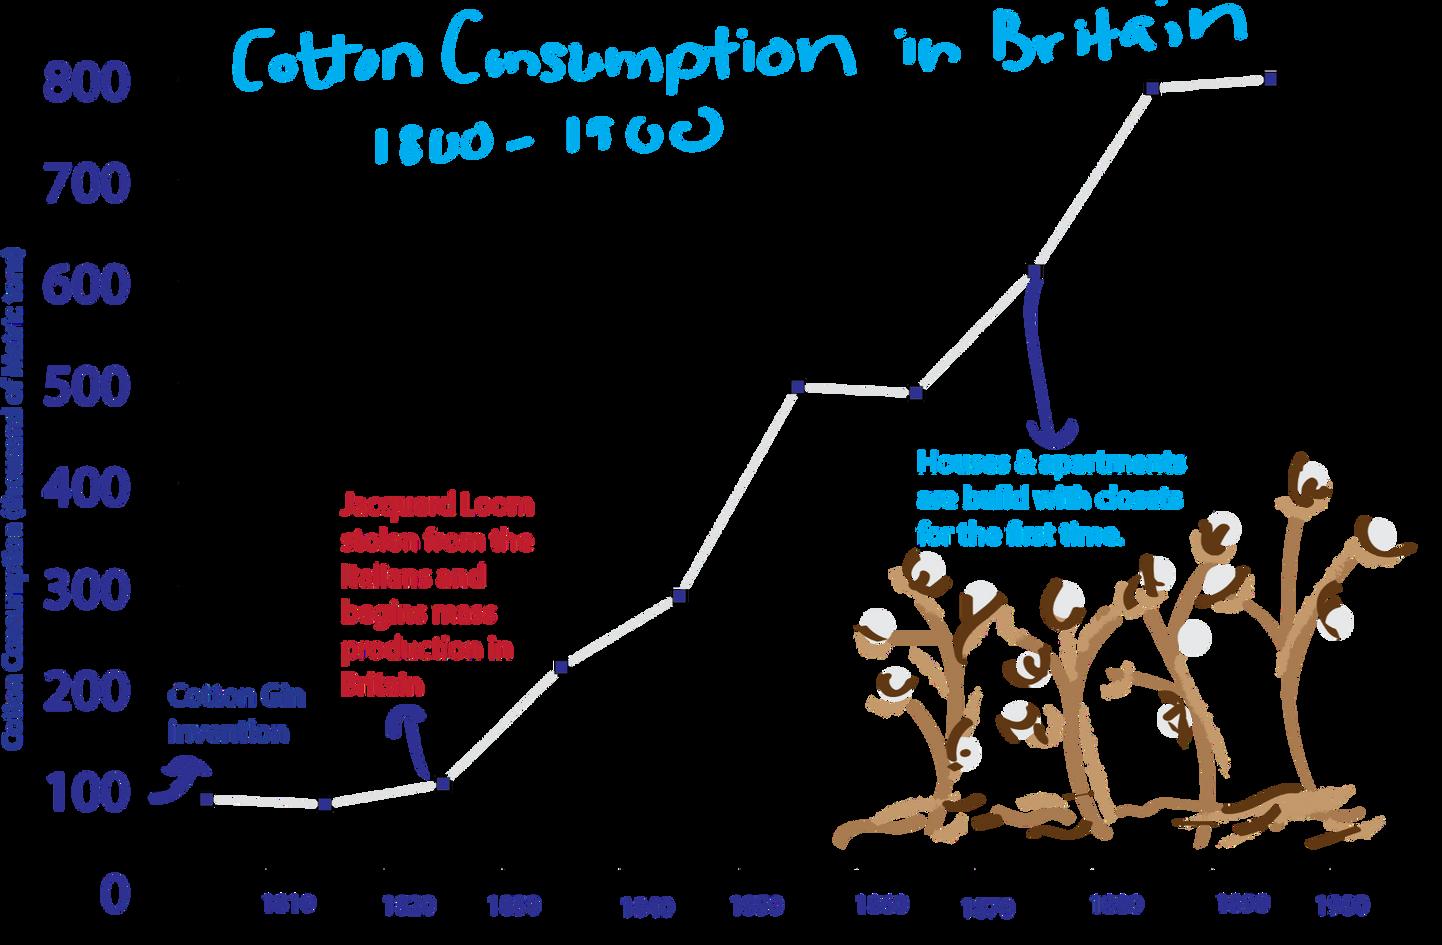 British Consumption Drives Southern Cotton Demand